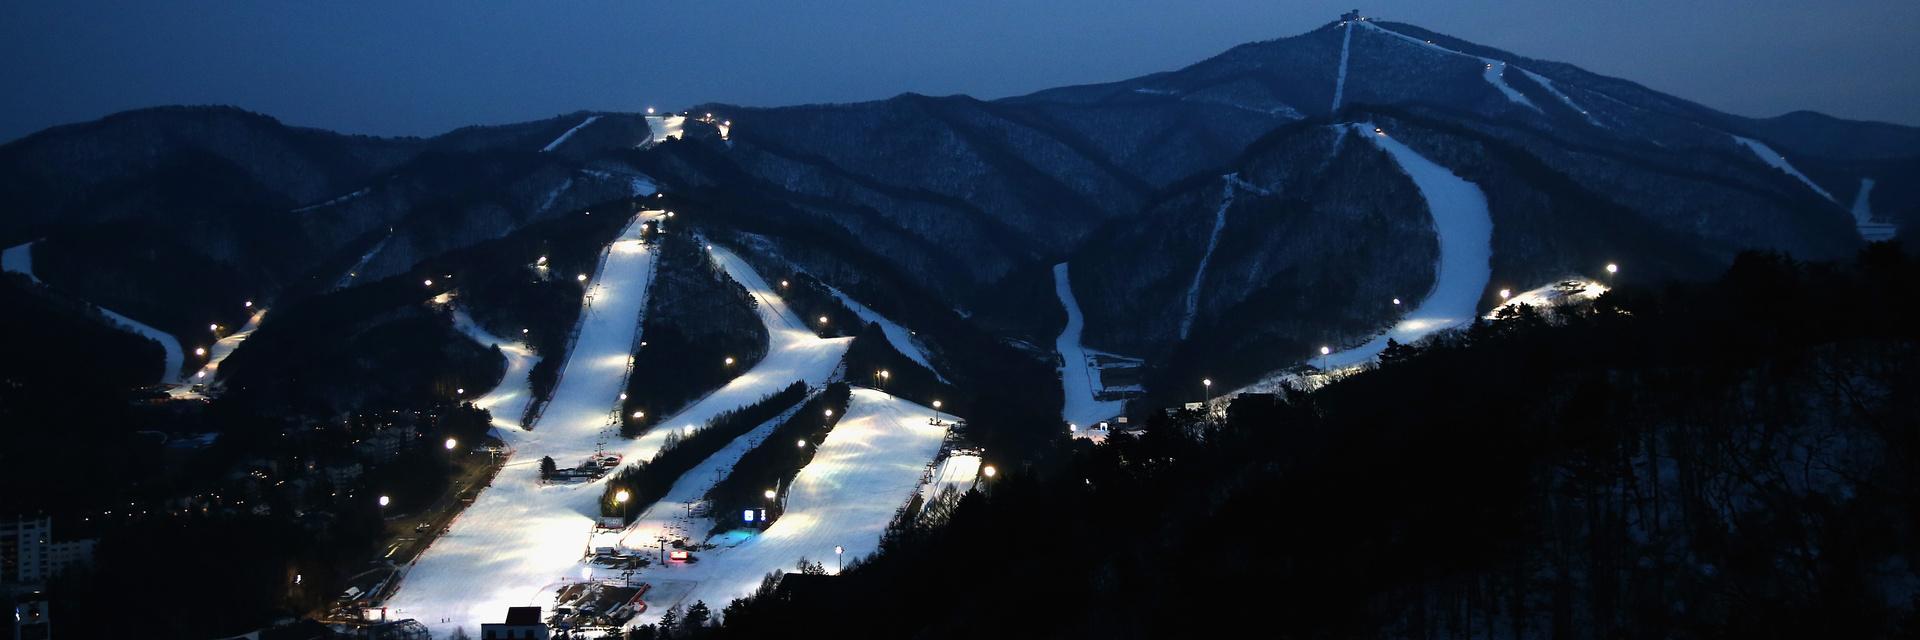 Jongpjong Alpine Centre